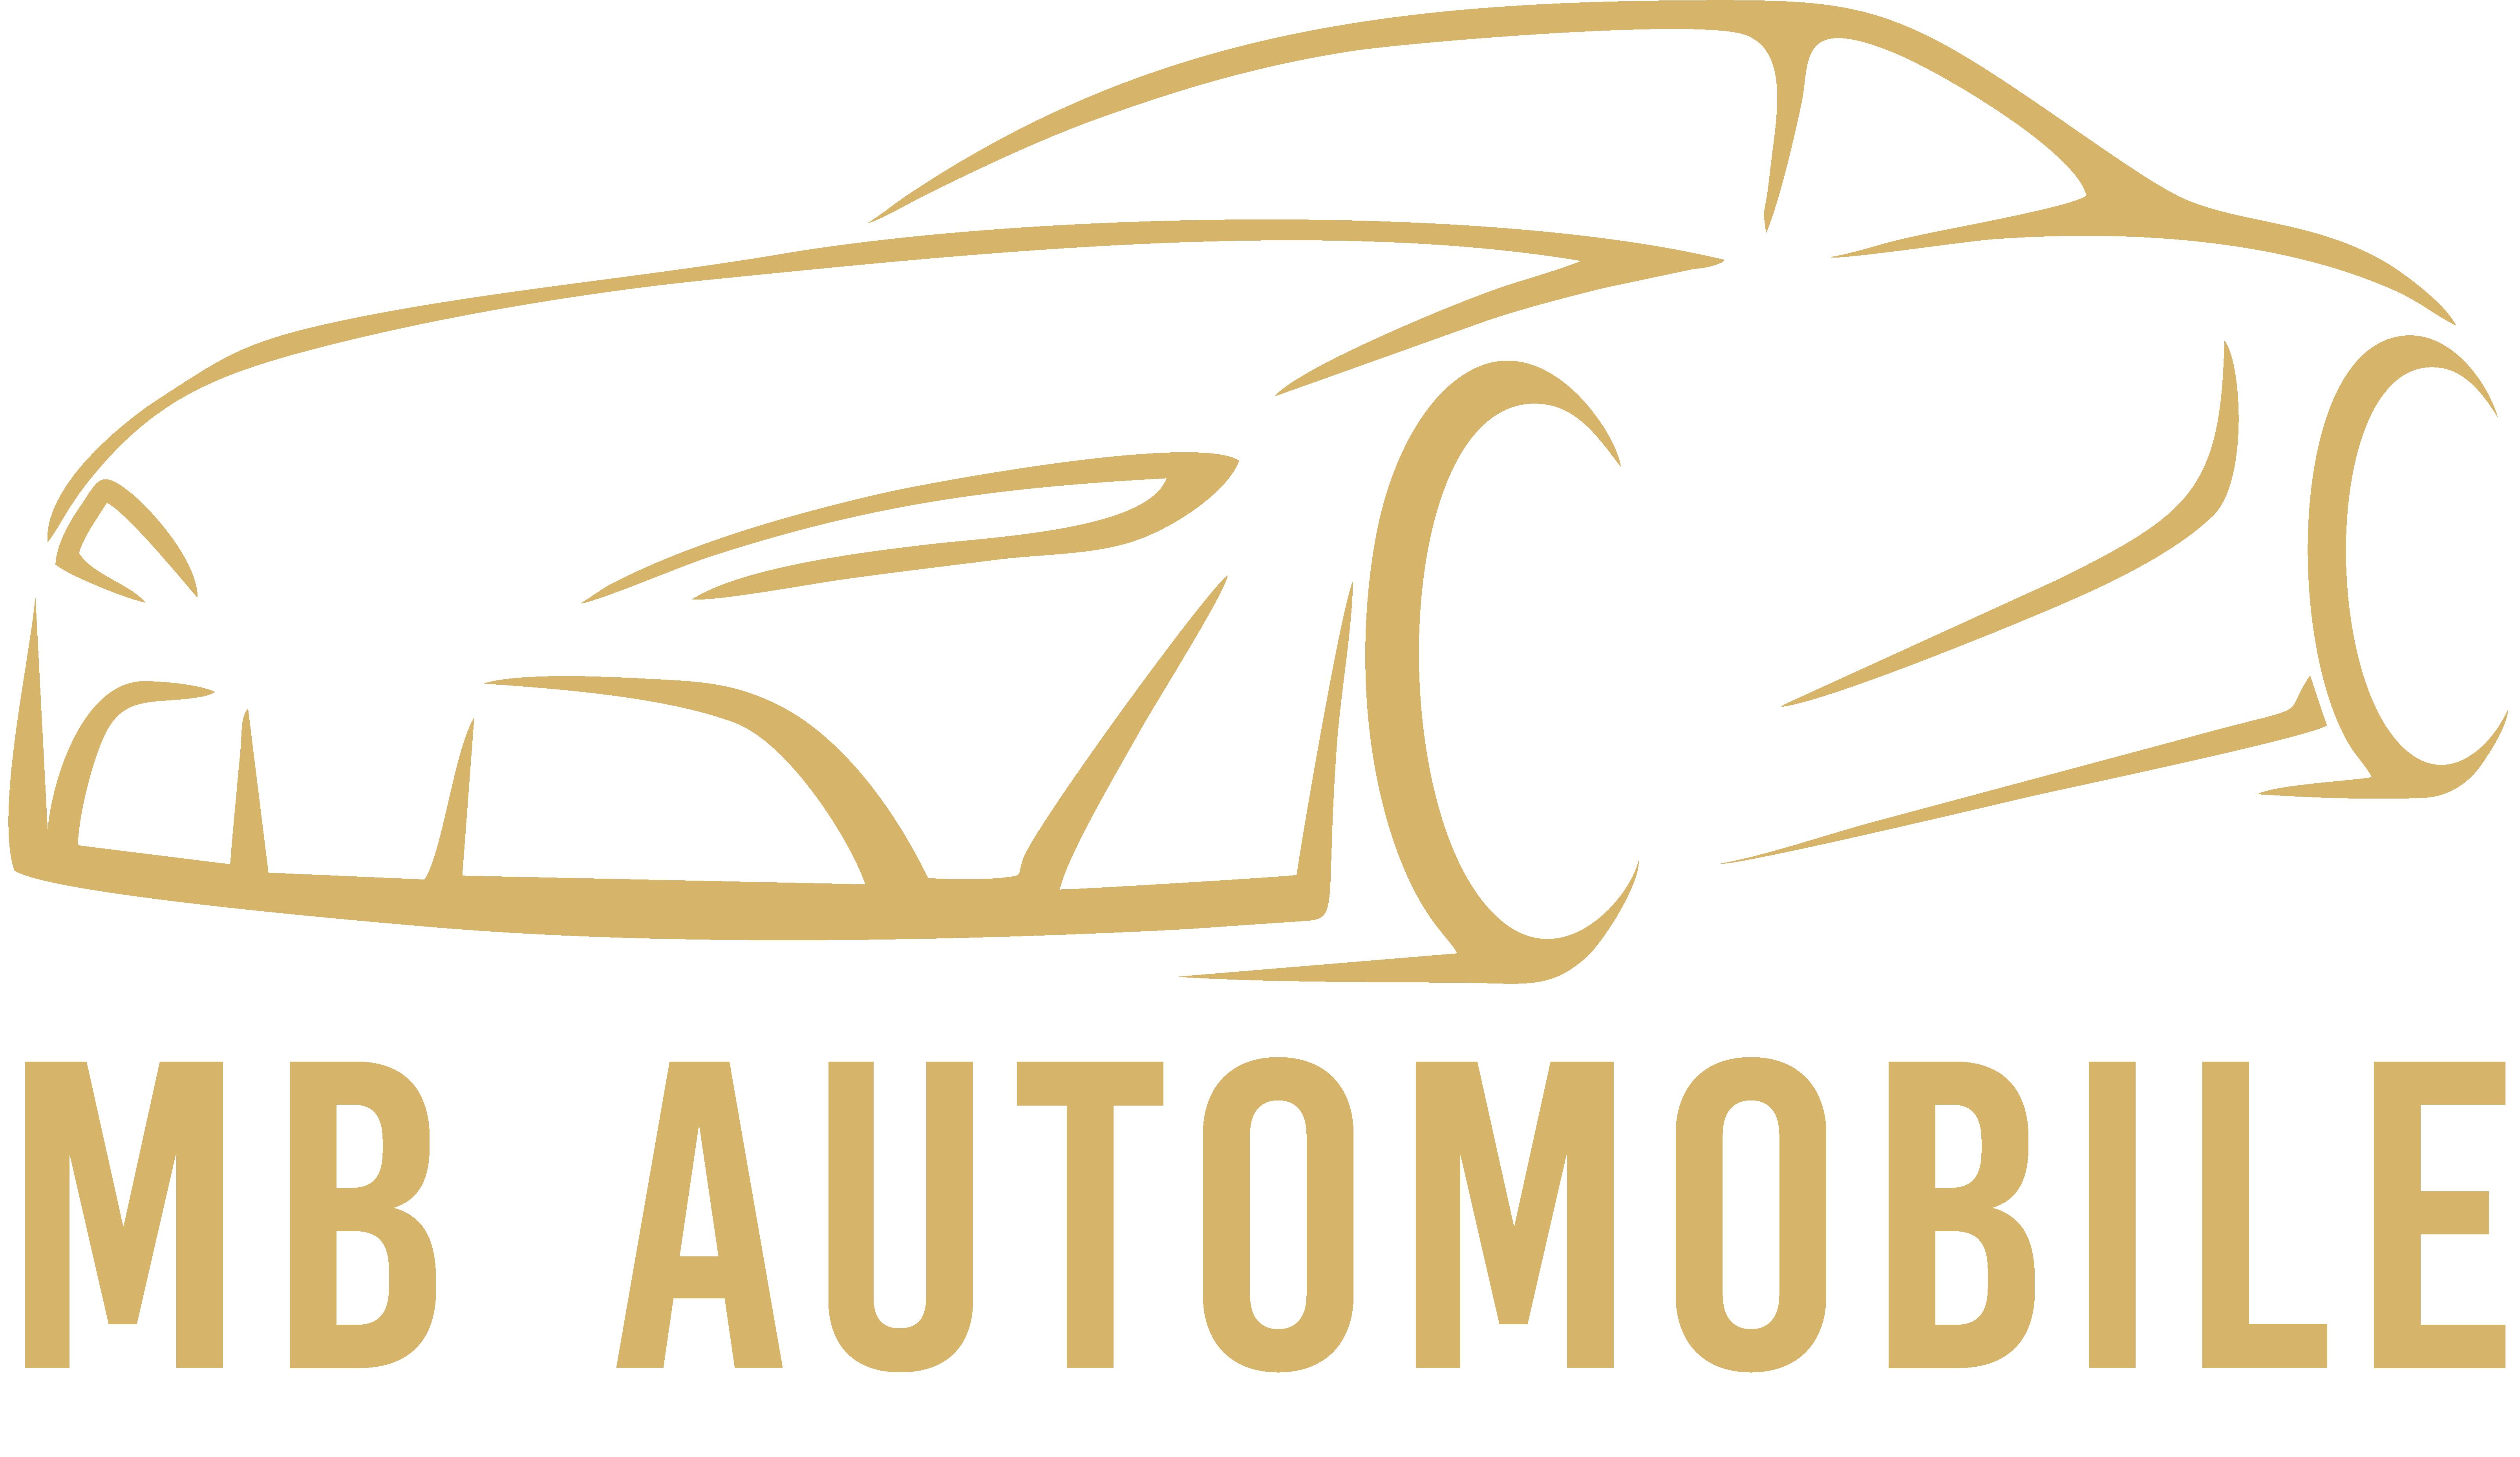 MB Automobile AG